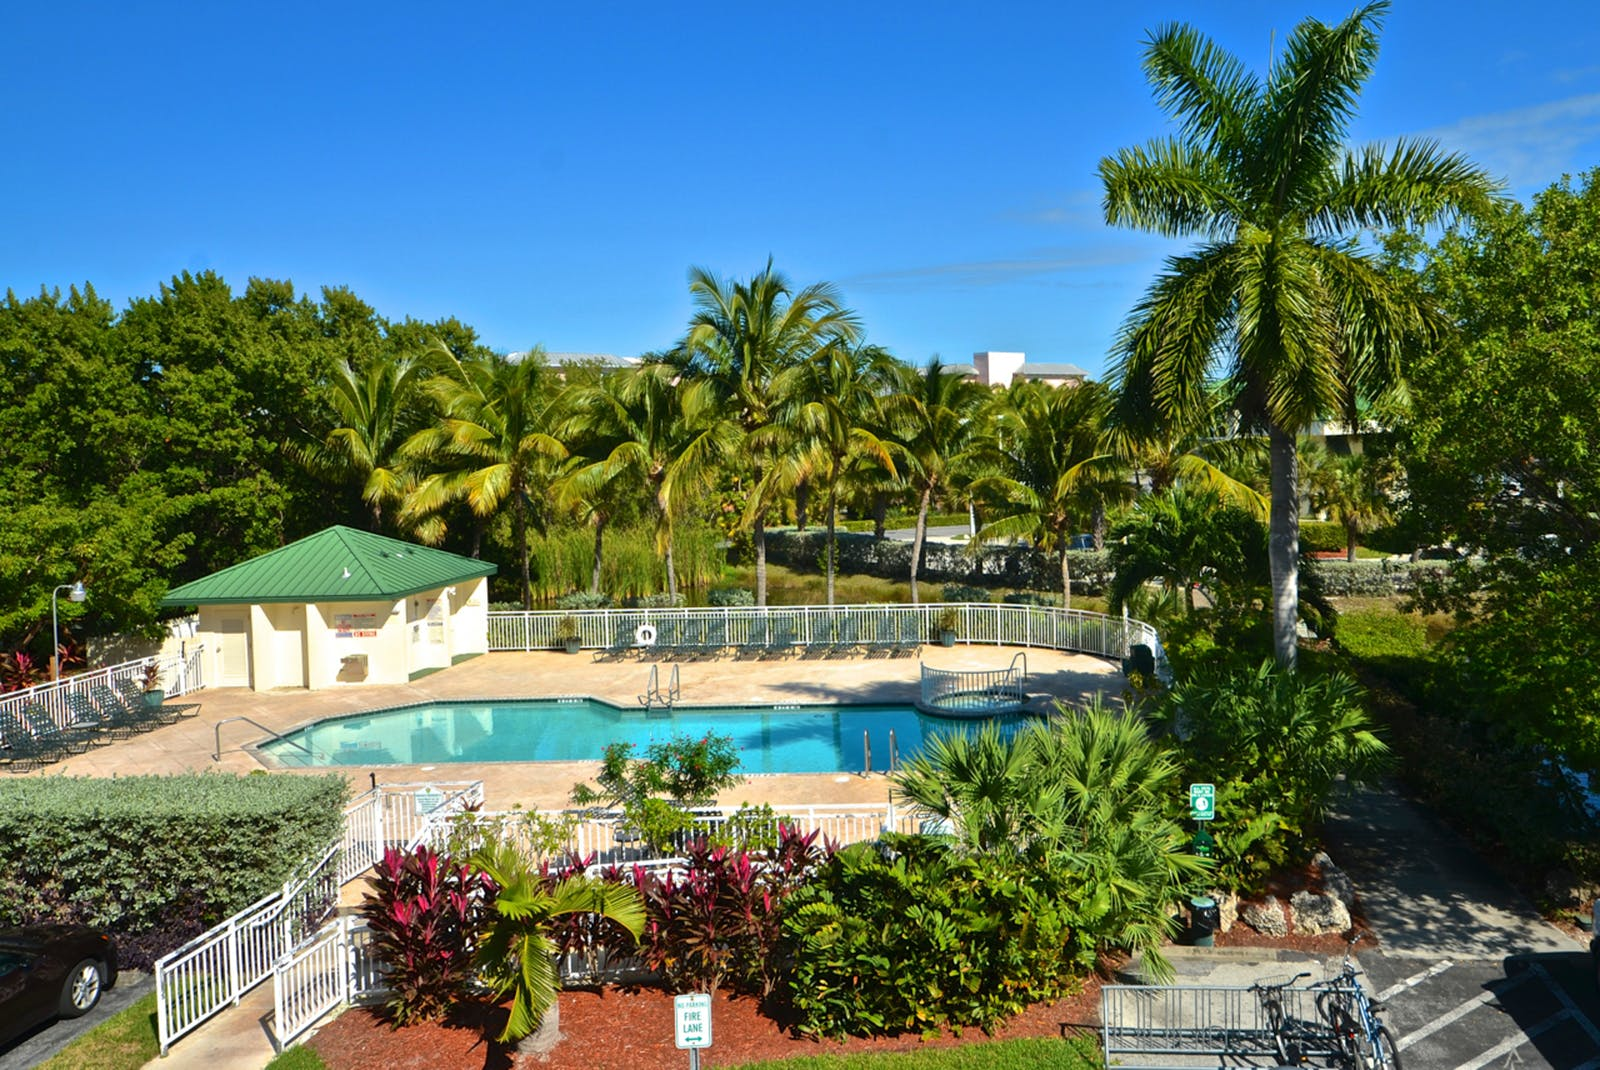 Sunrise Suites Resort | Key West Vacation Rentals